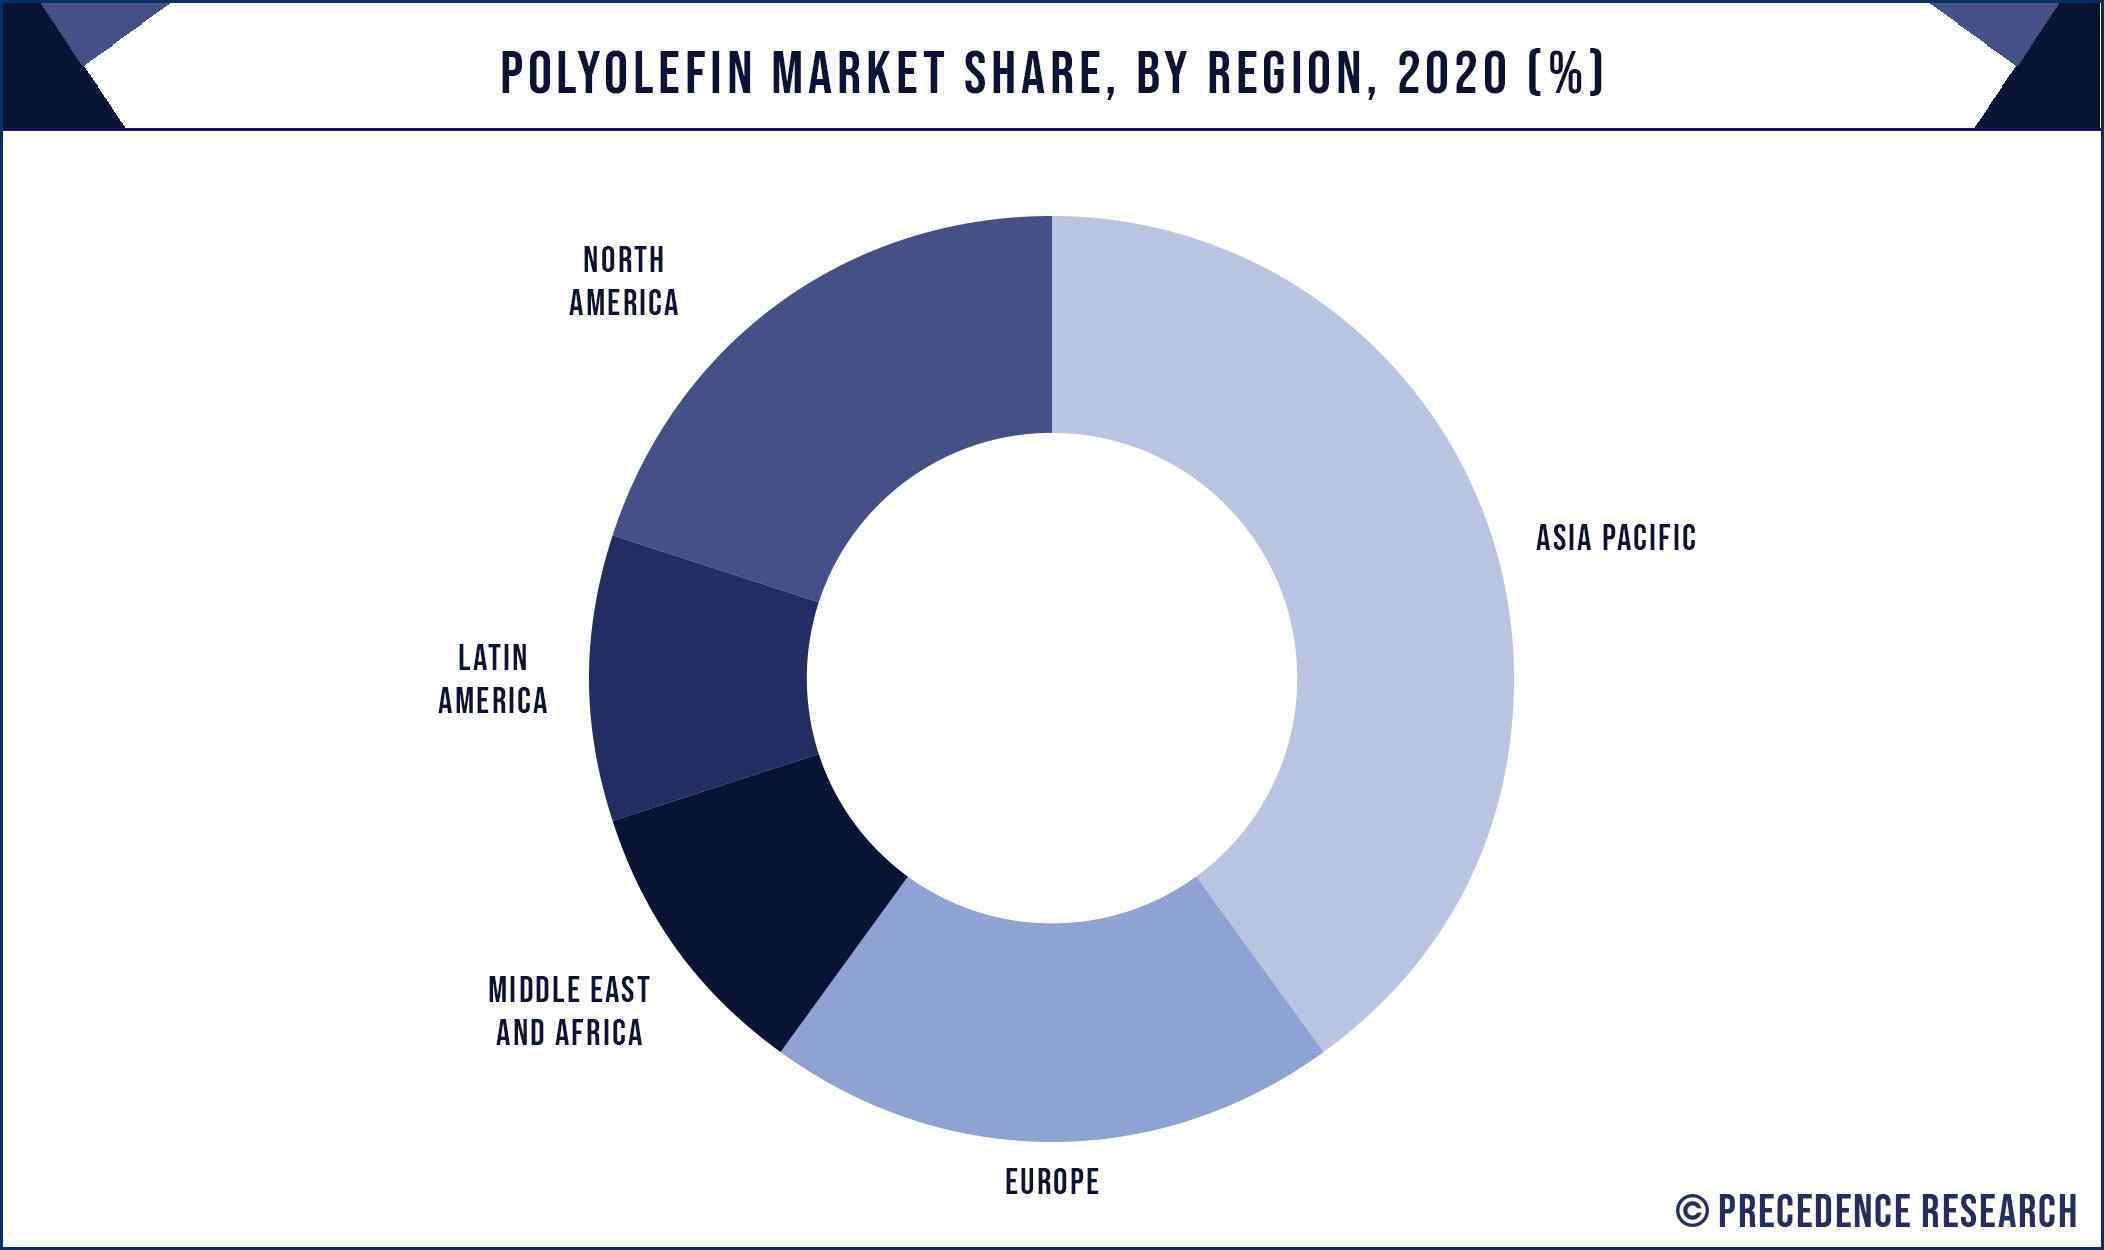 Polyolefin Market Share, By Region, 2020 (%)